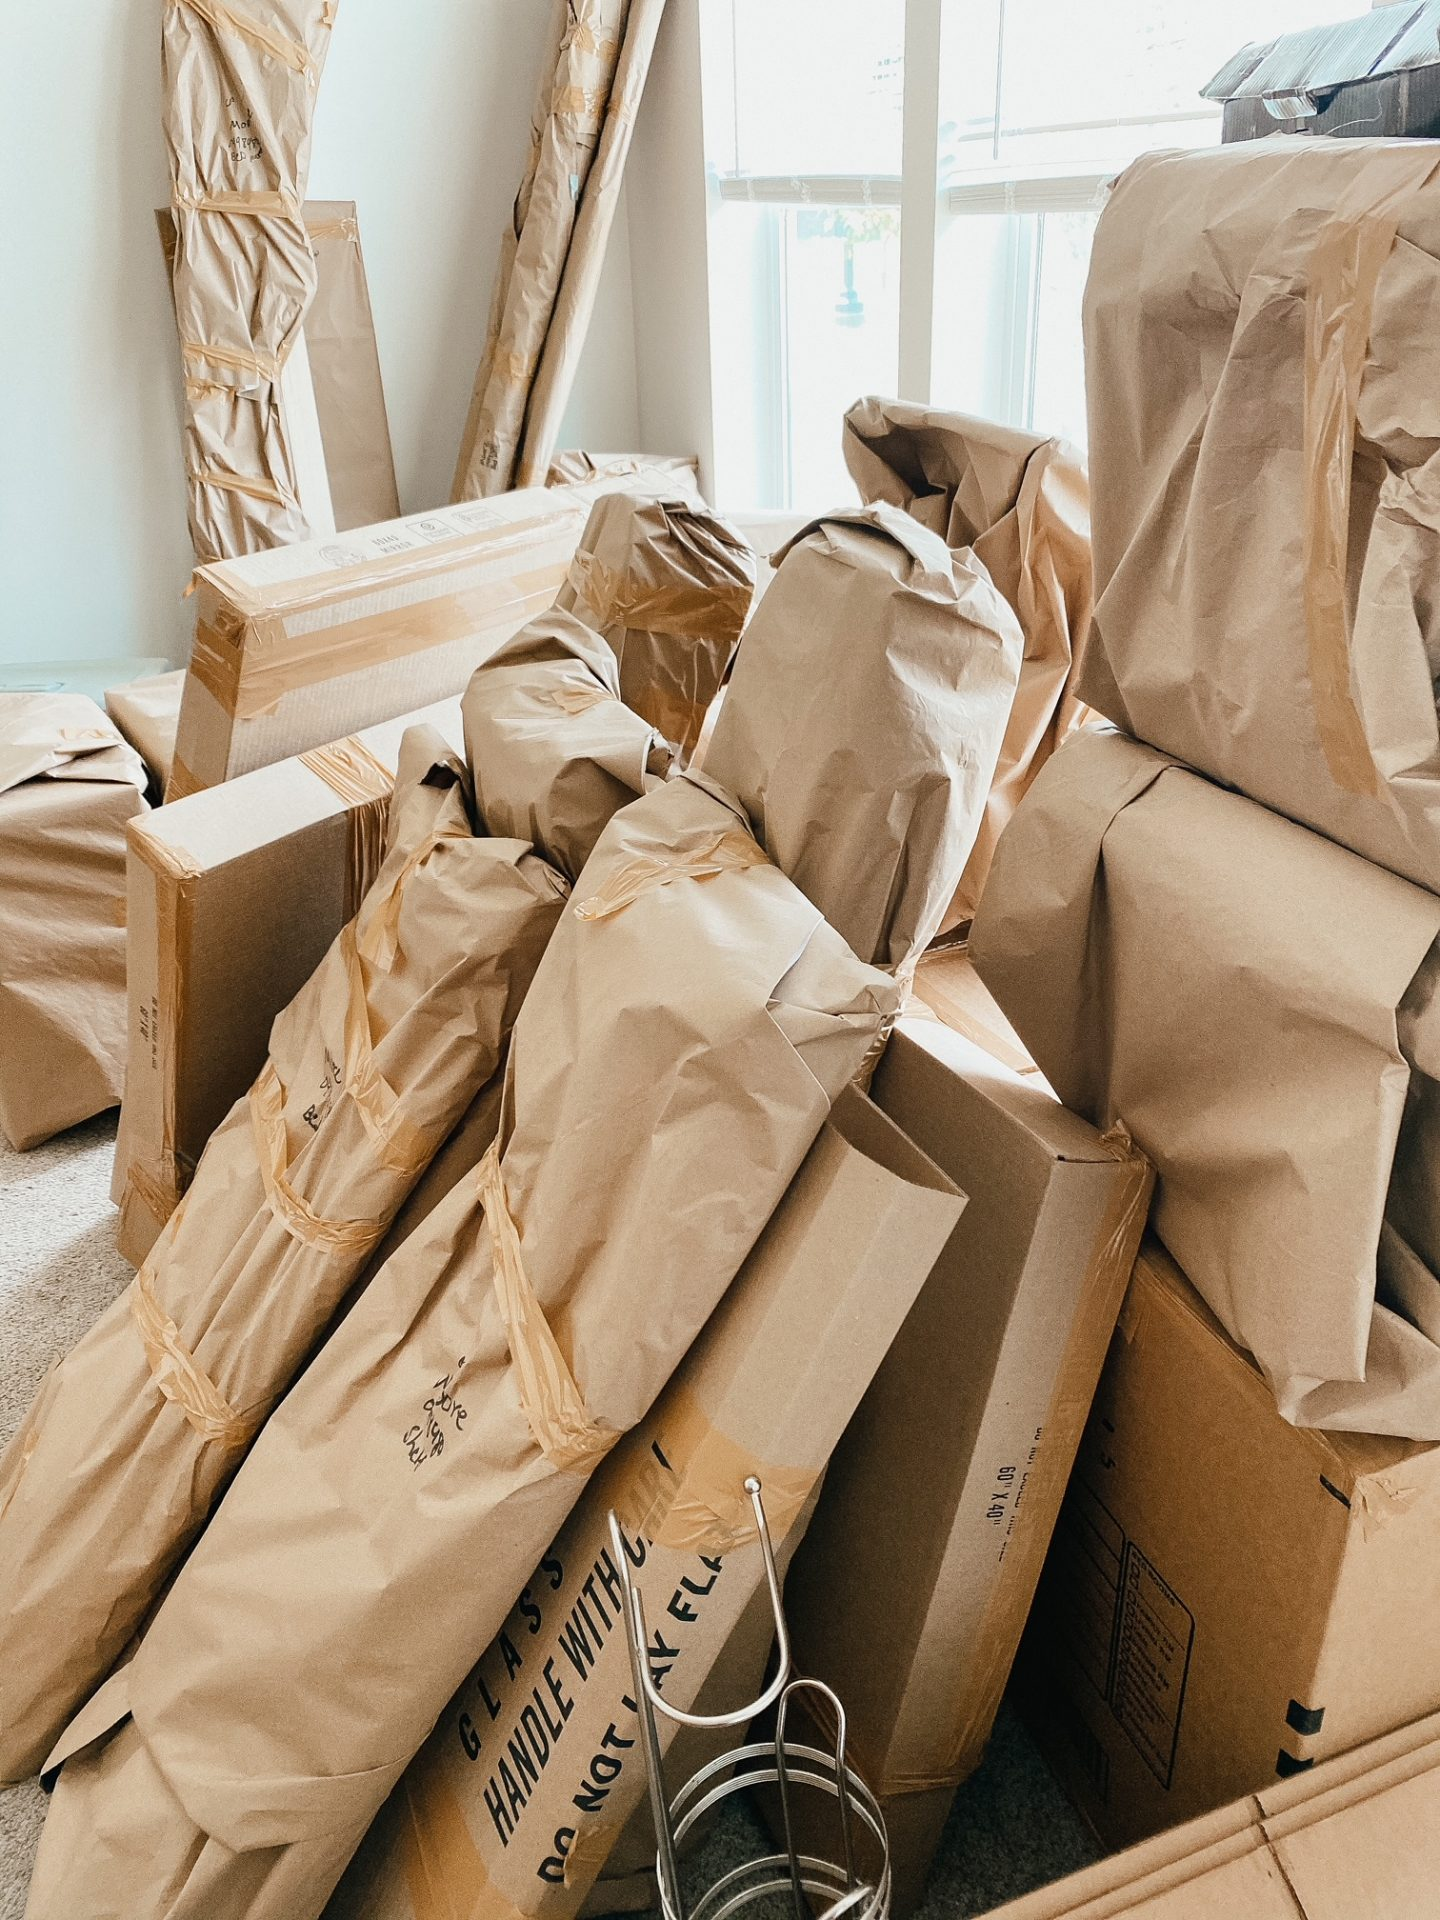 moving household goods